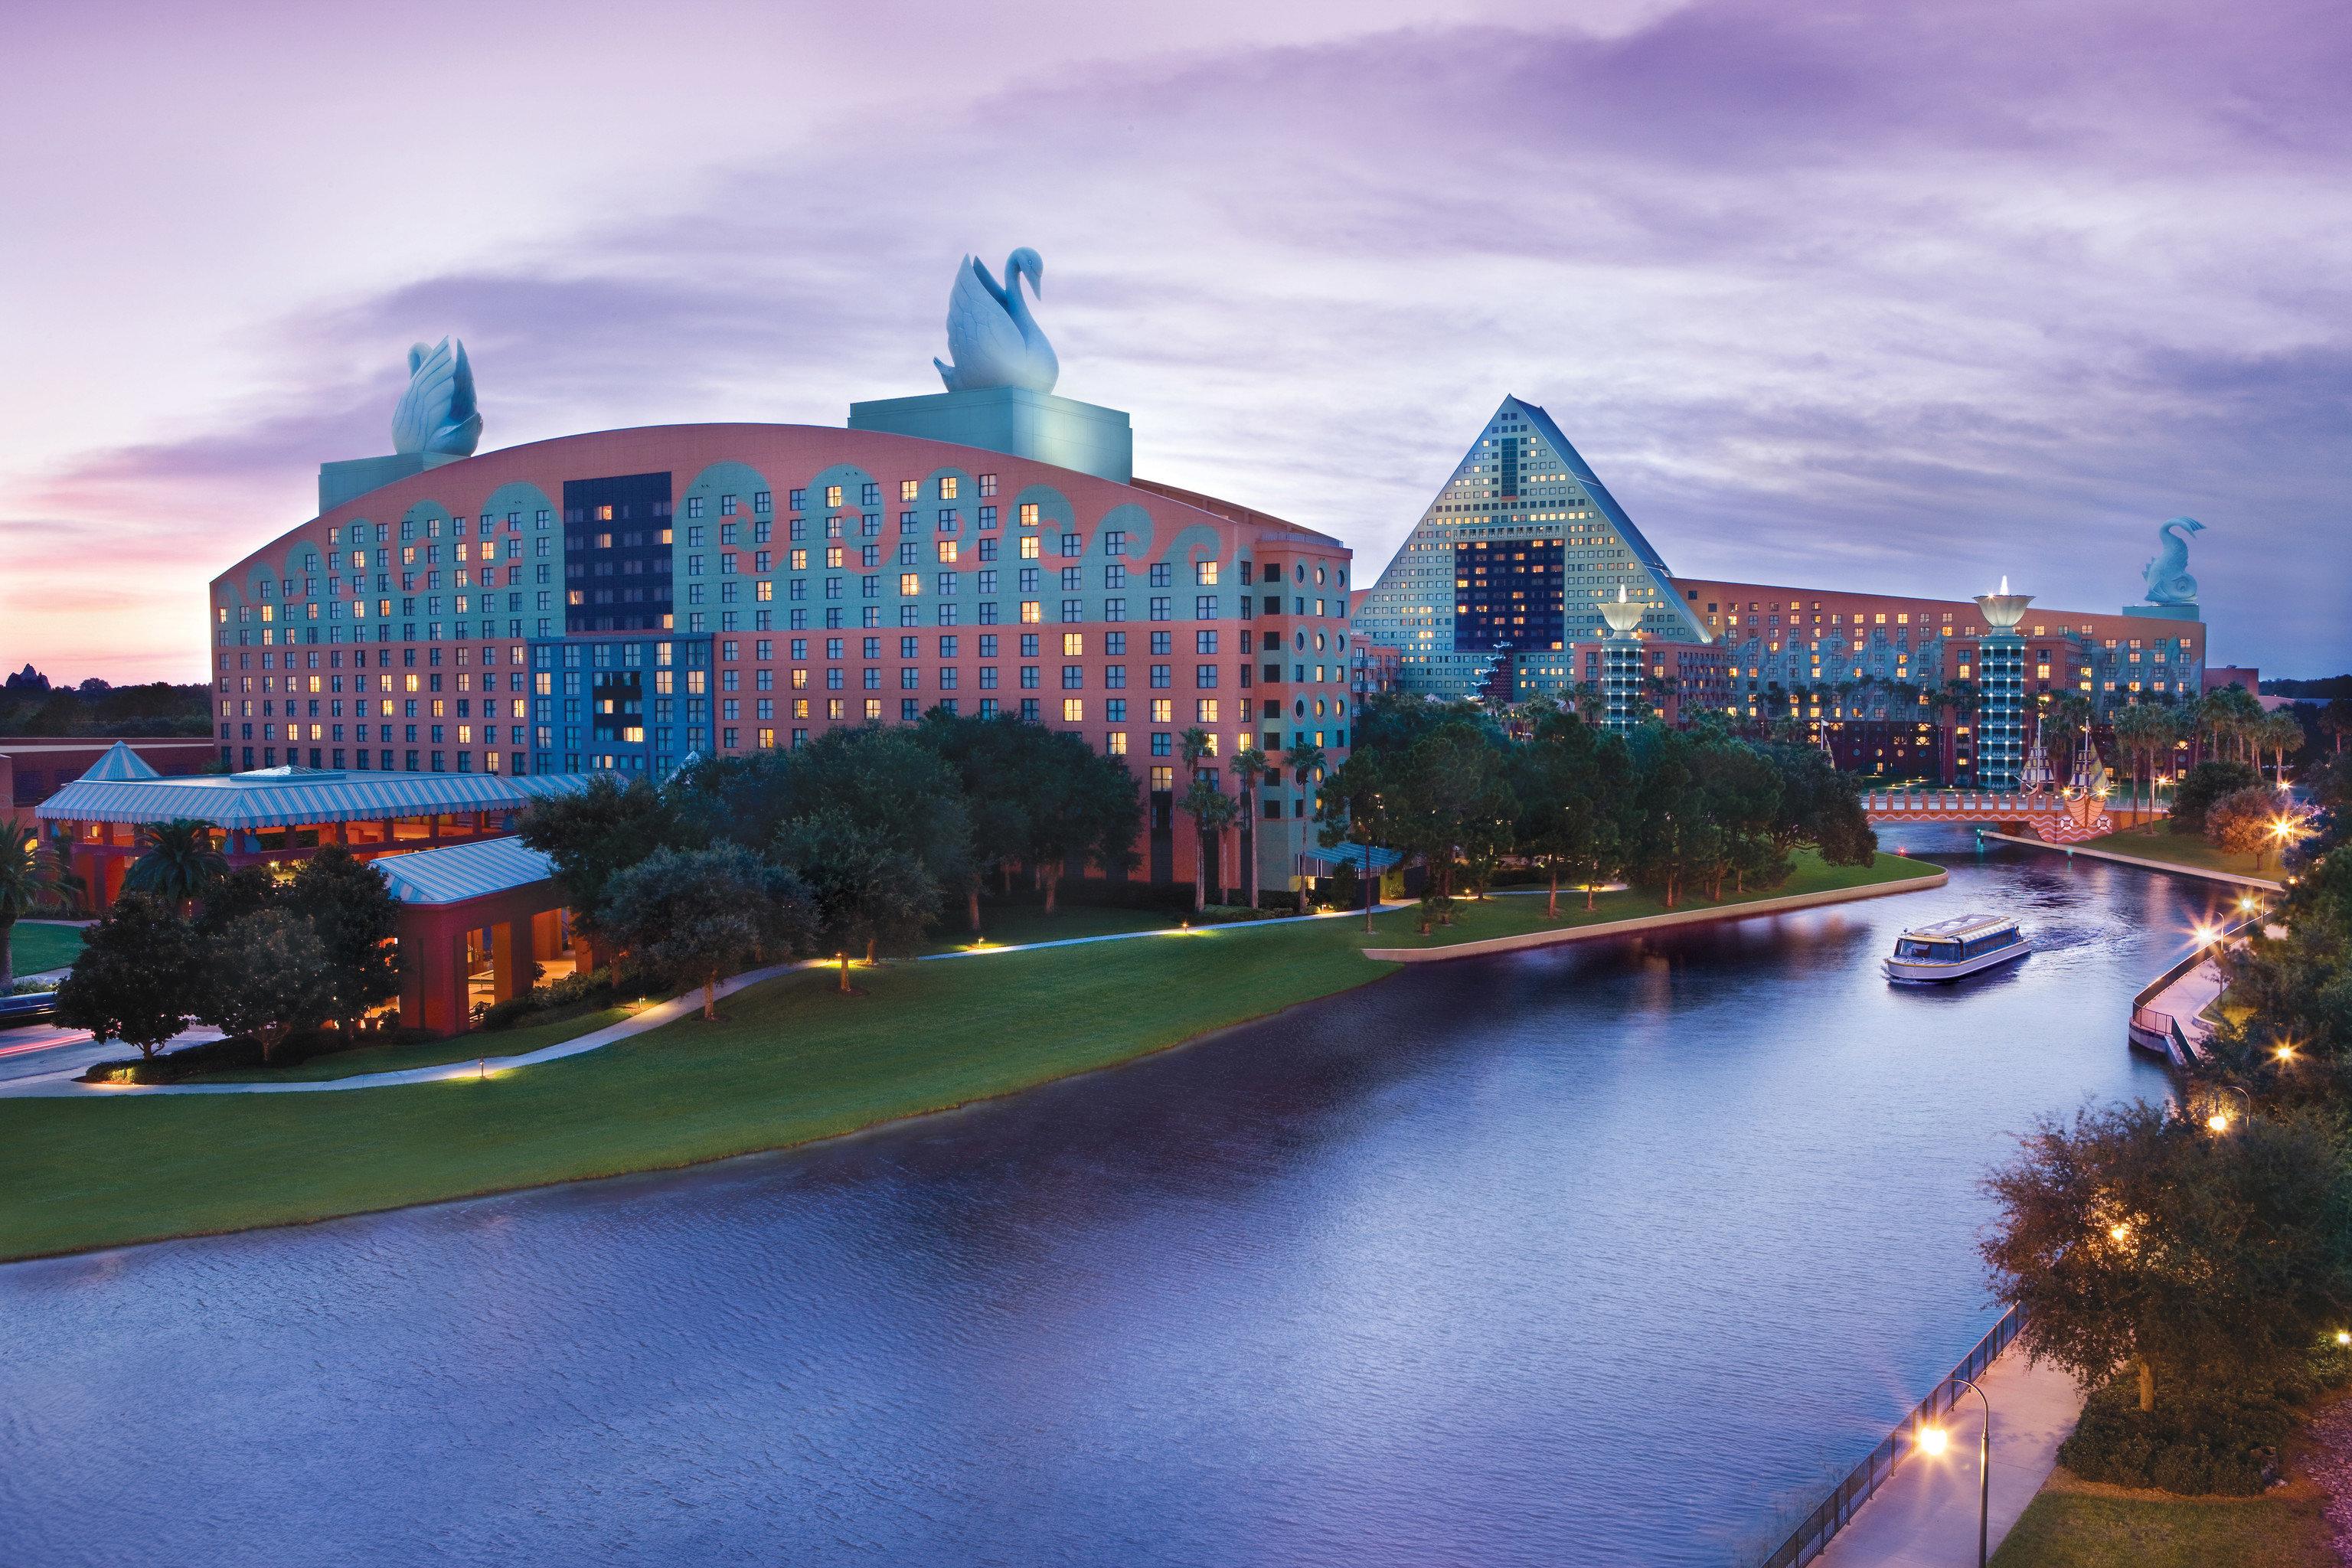 sky landmark City cityscape skyline night sport venue River evening Downtown waterway dusk aerial photography